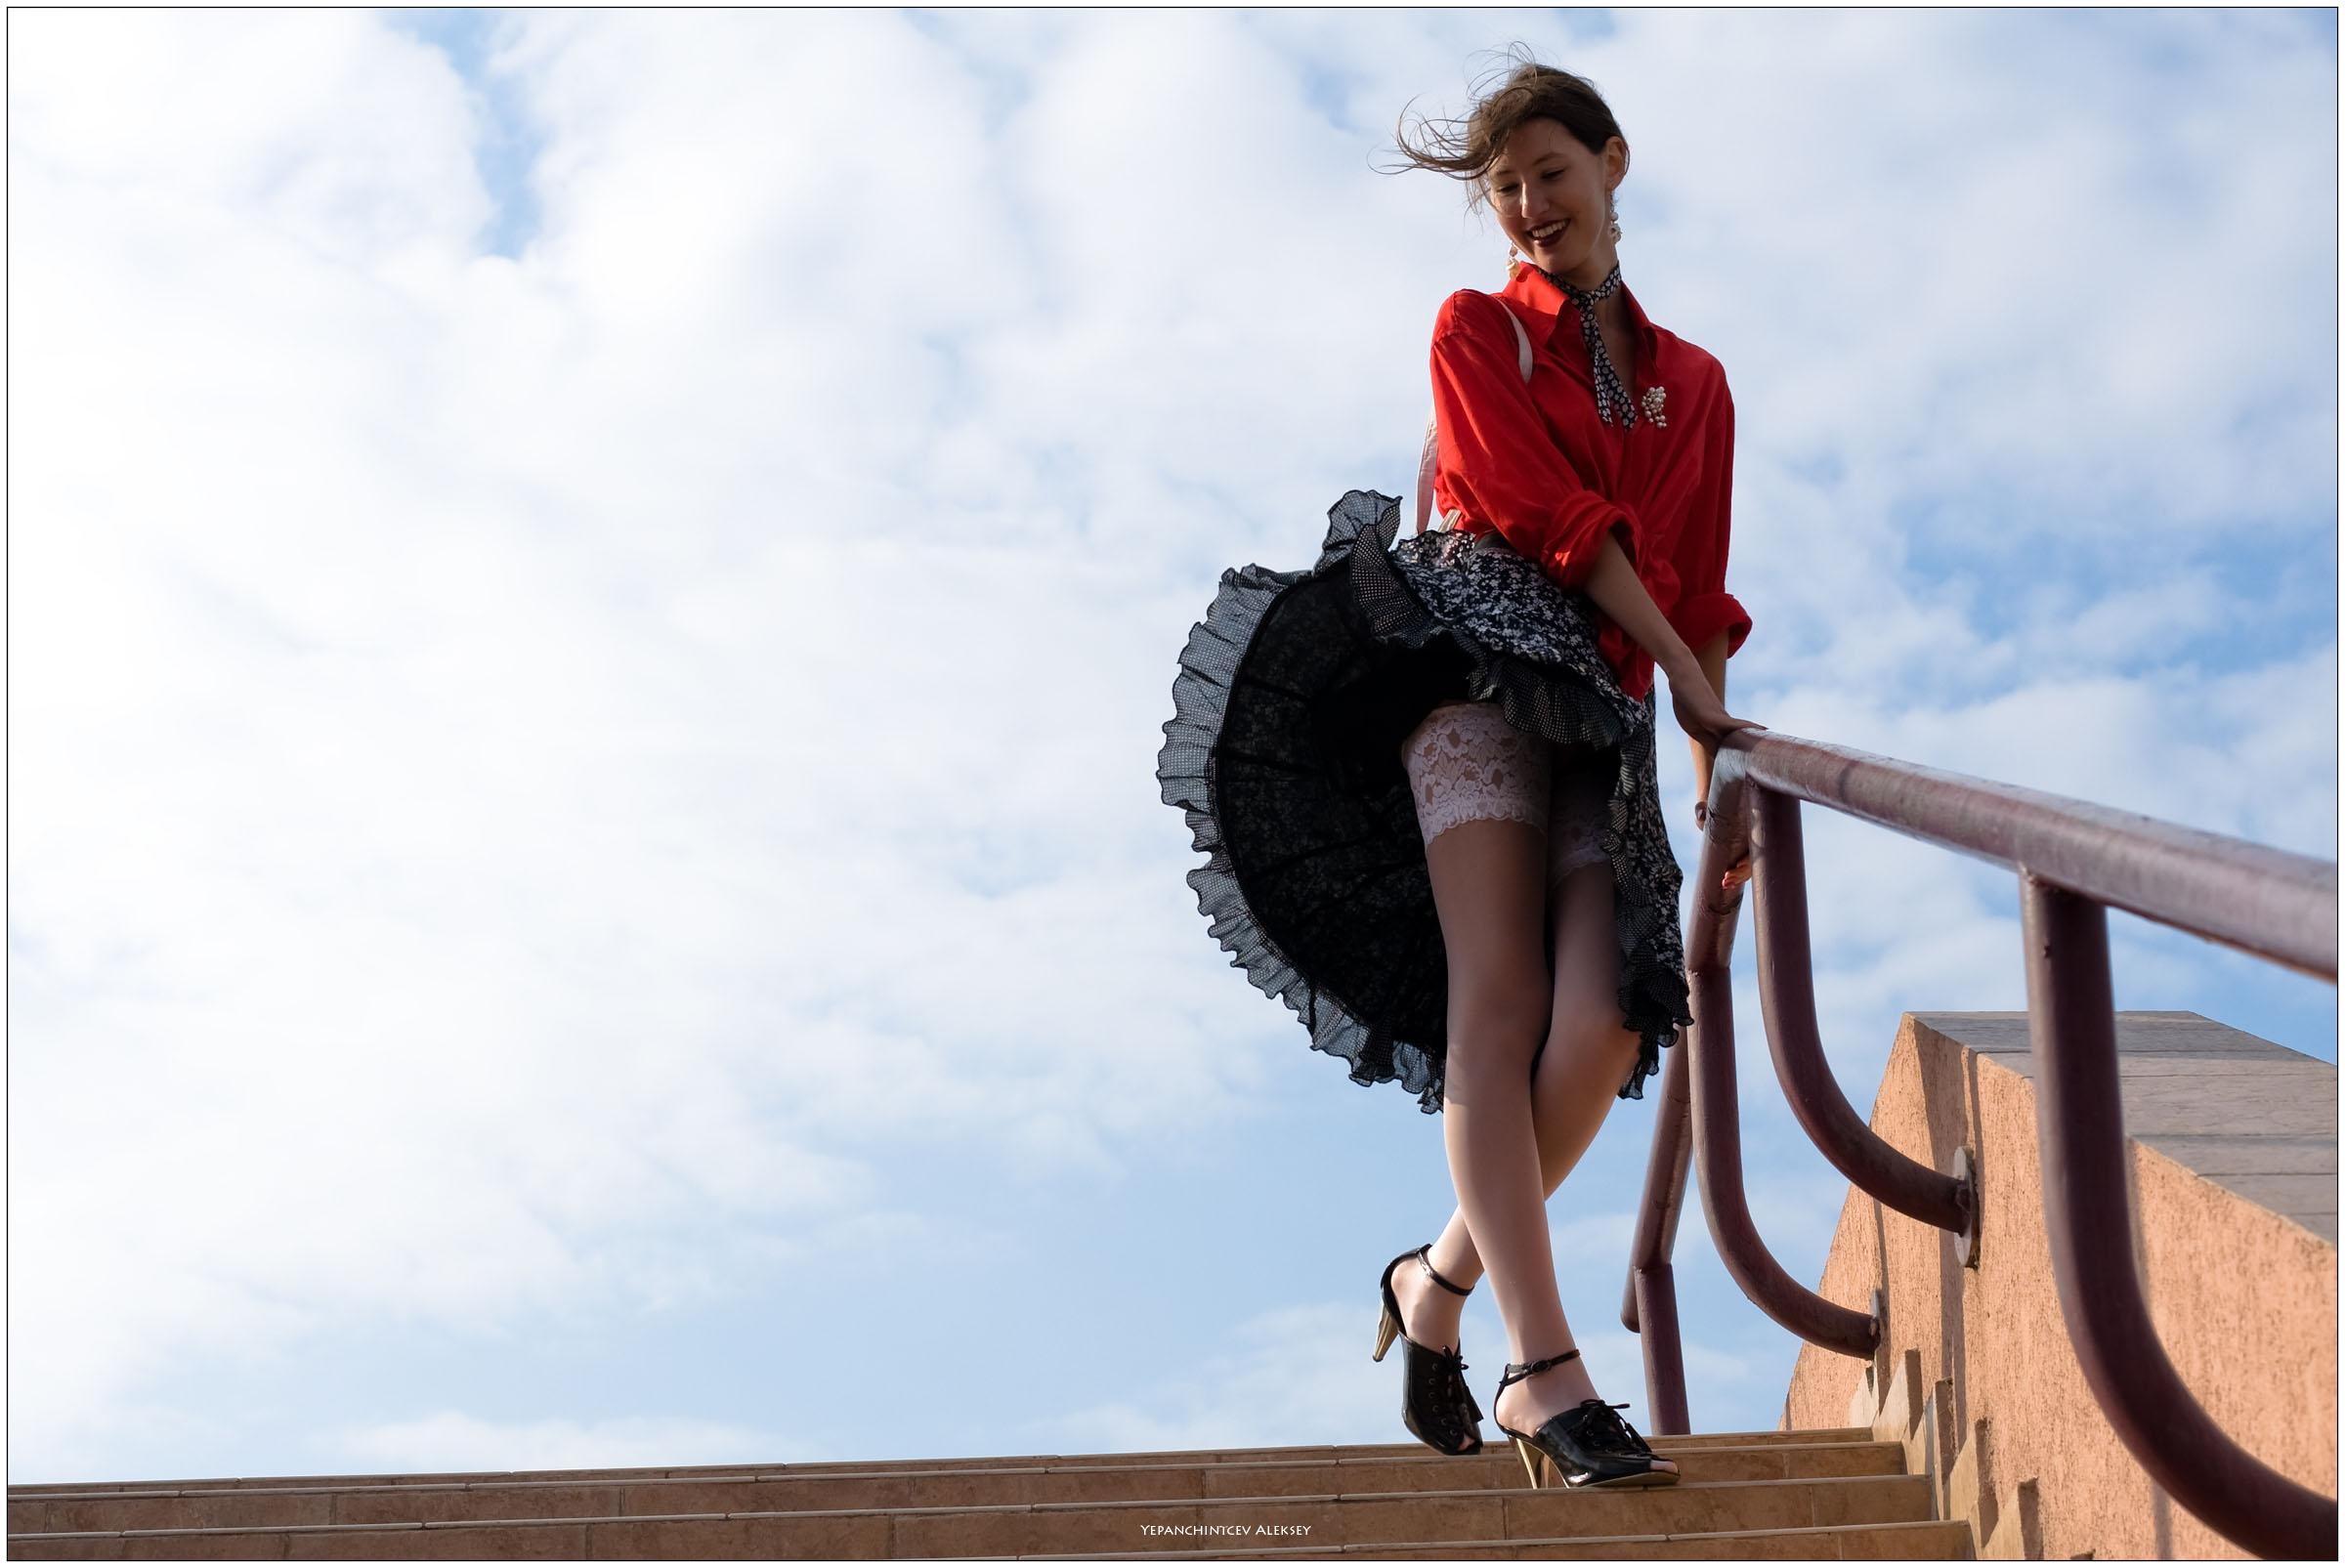 Офисе трахает девушкам ветер поднял юбку сосет фото порно